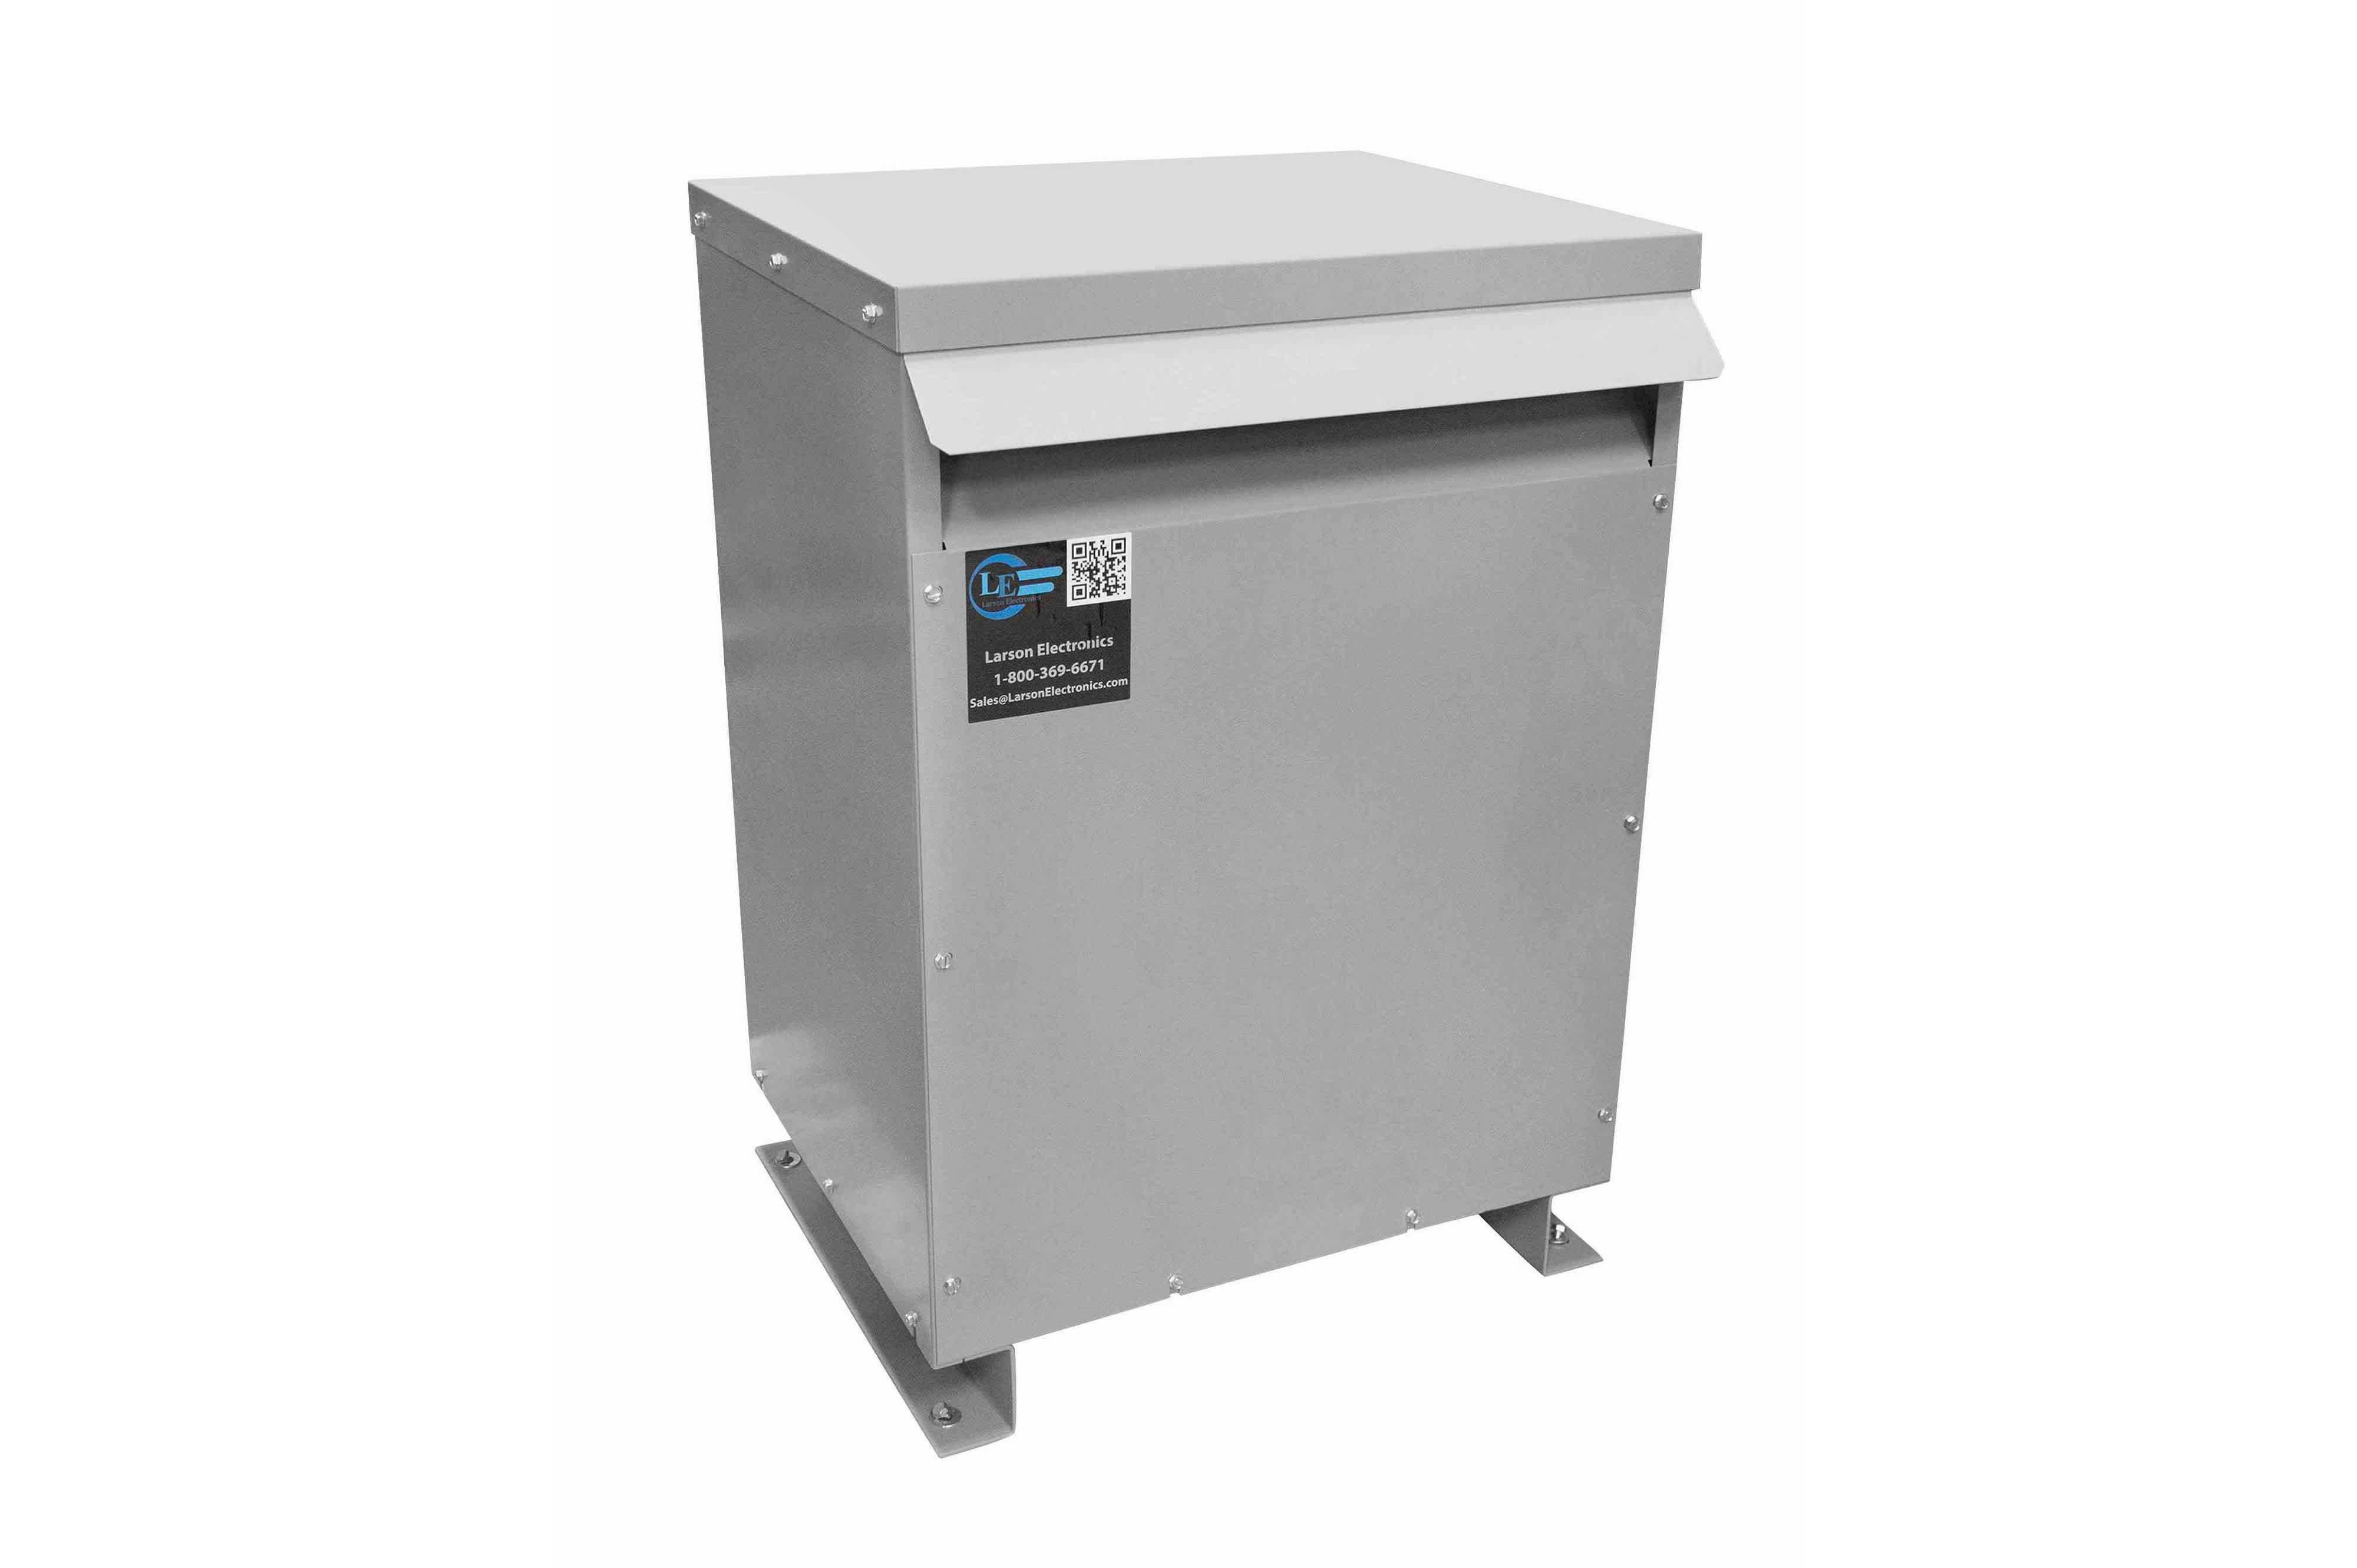 200 kVA 3PH Isolation Transformer, 380V Wye Primary, 480Y/277 Wye-N Secondary, N3R, Ventilated, 60 Hz